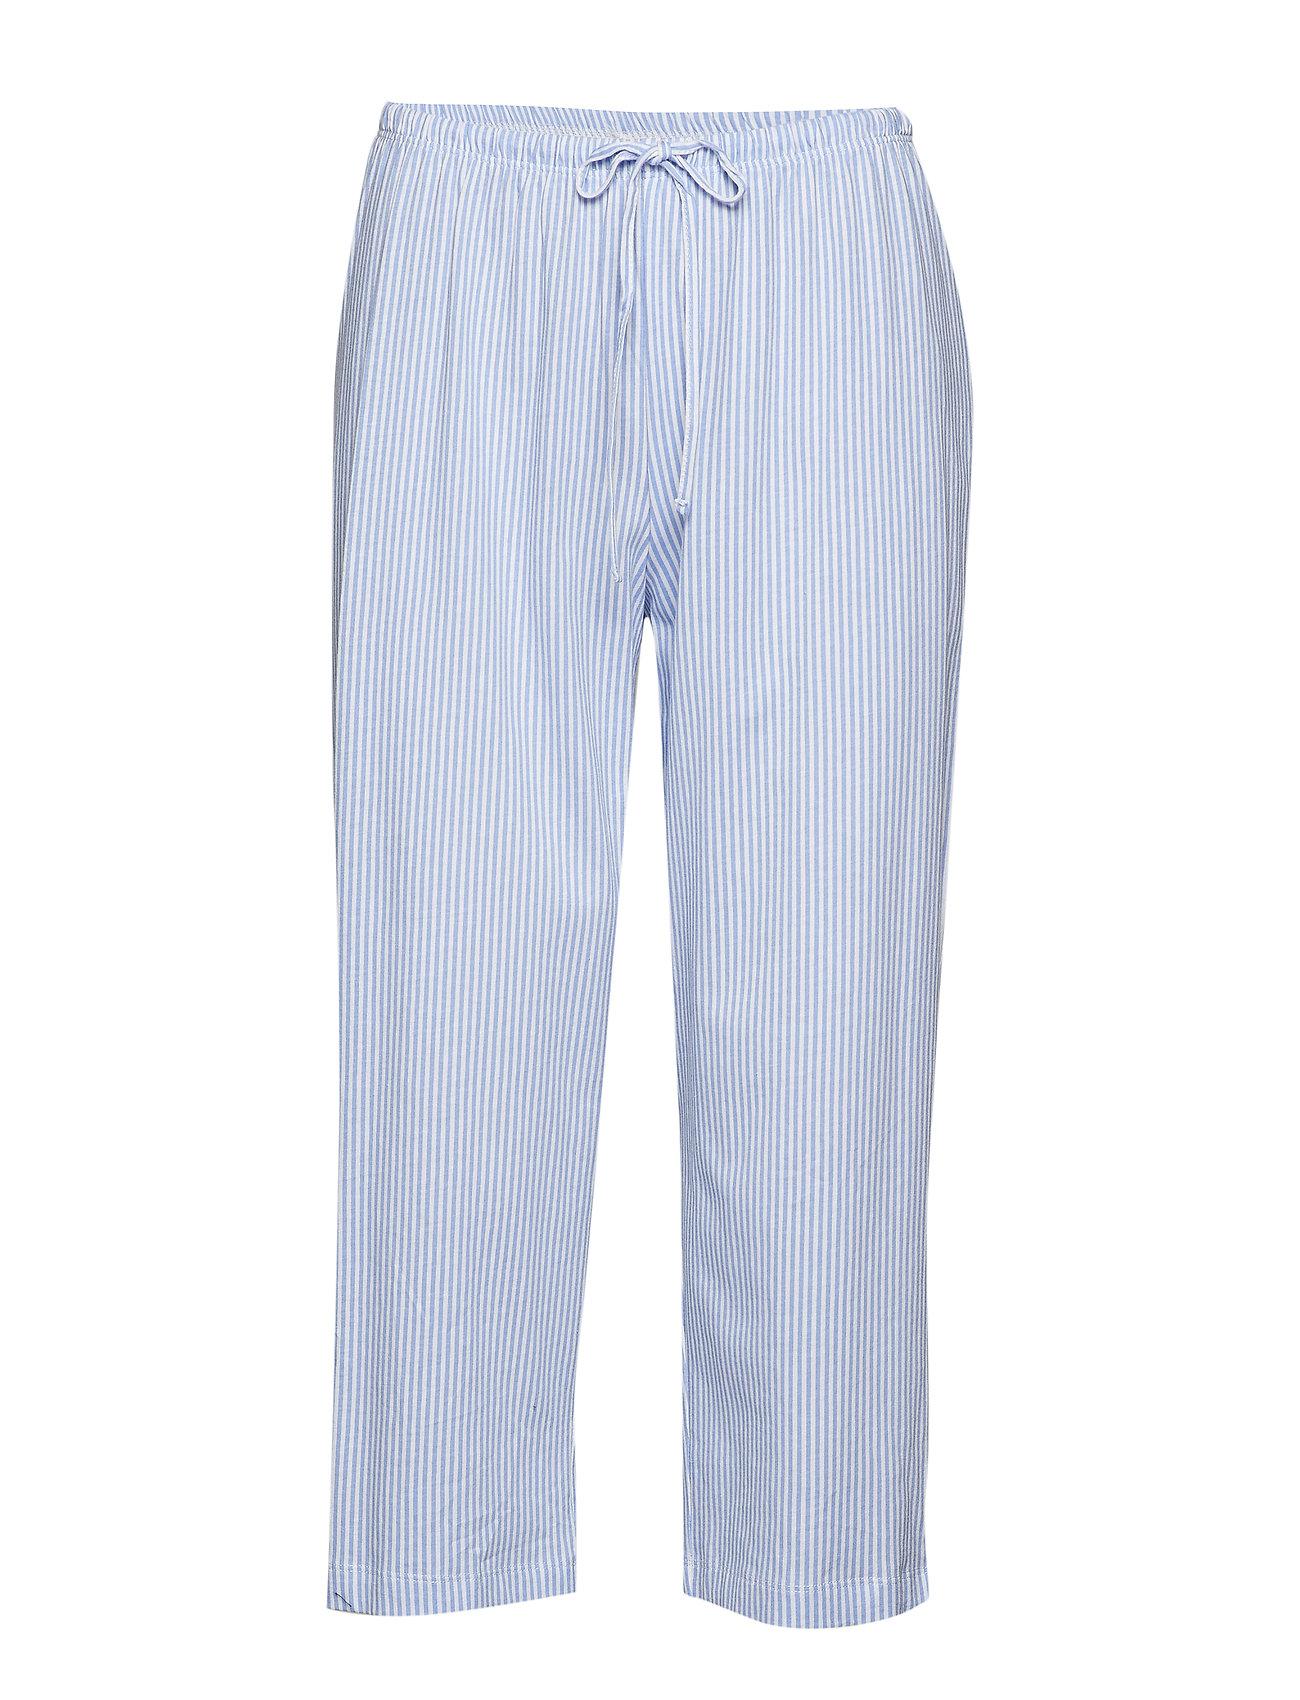 white Sl StripeLauren Notch 4 Ralph Homewear Setfrench Heritage Classic 3 Lrl Pj Blue E2DH9I